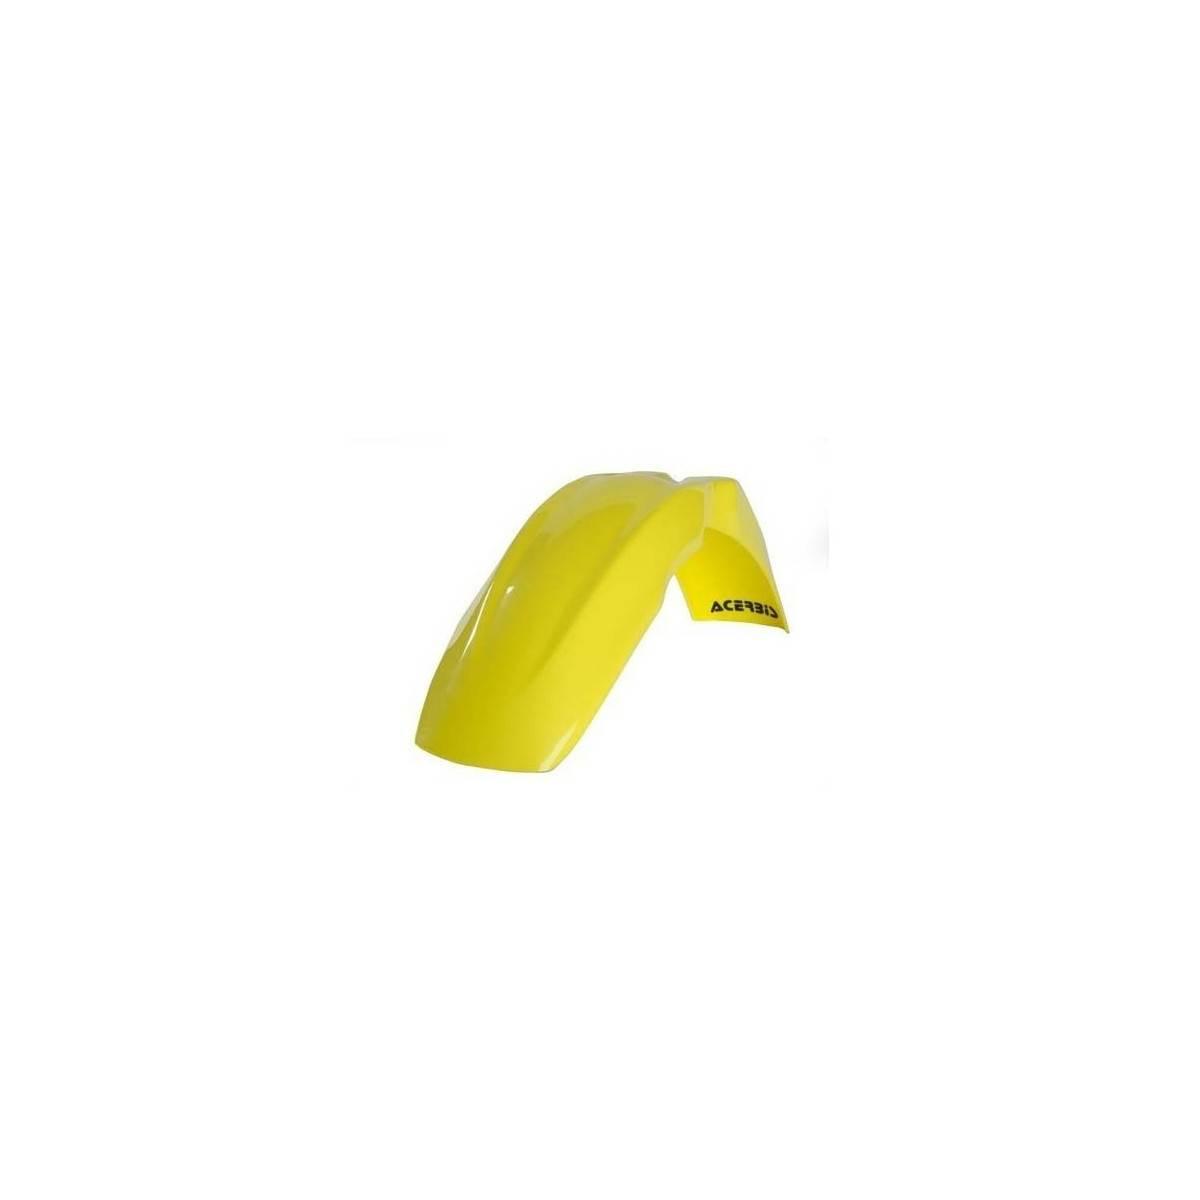 0011642-060 - Guardabarros Delantero Suzuki 10 18 Amarillo